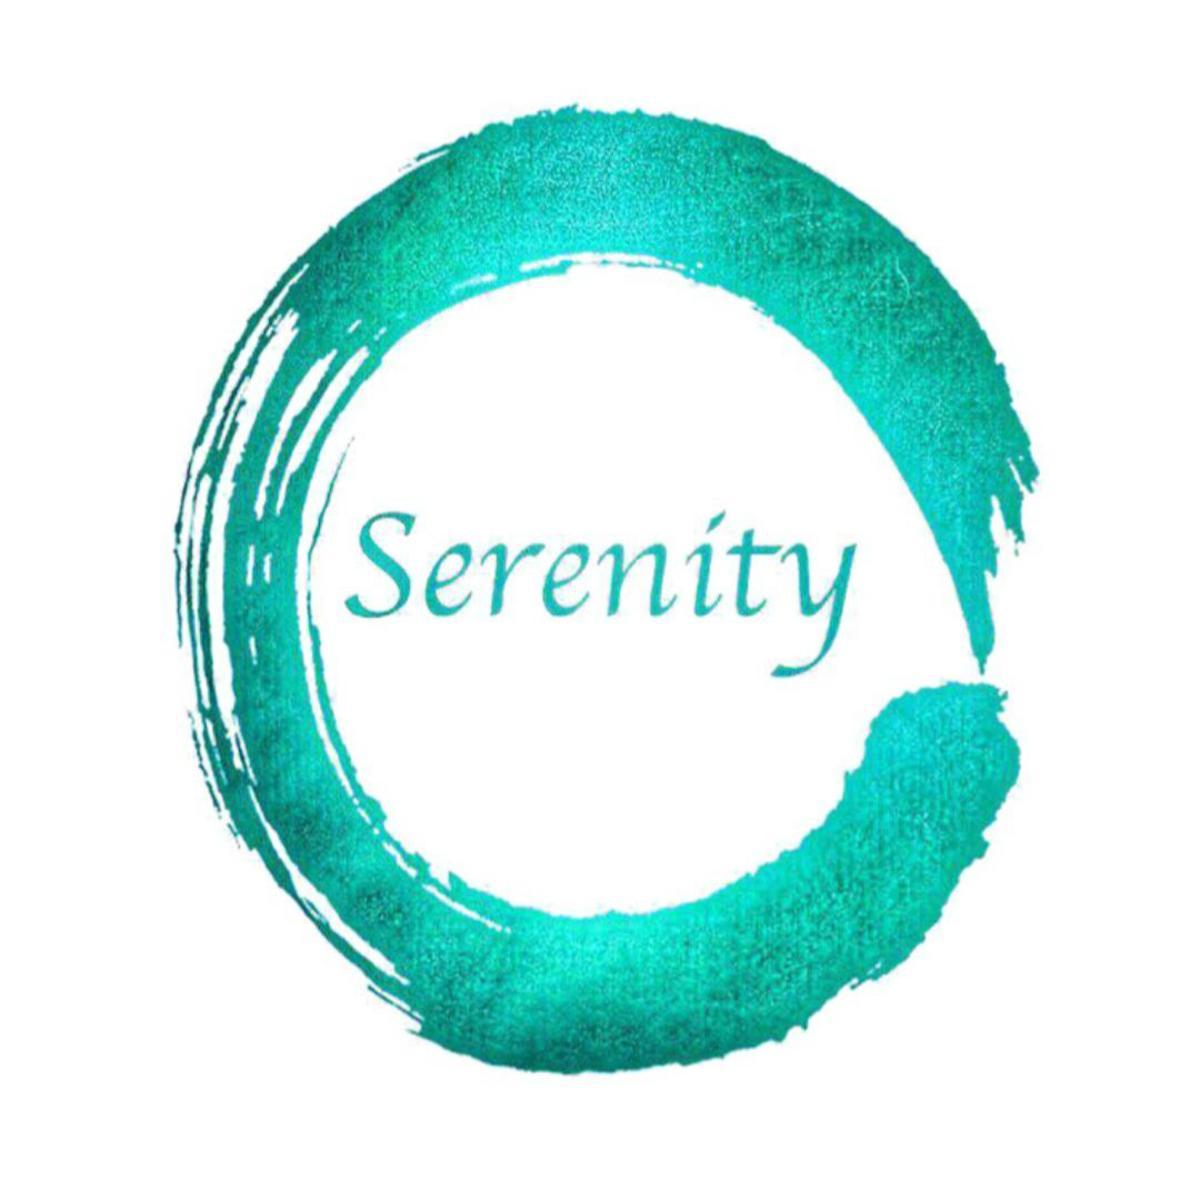 Serenity Prayer Originally Invoked the Name of Jesus Christ